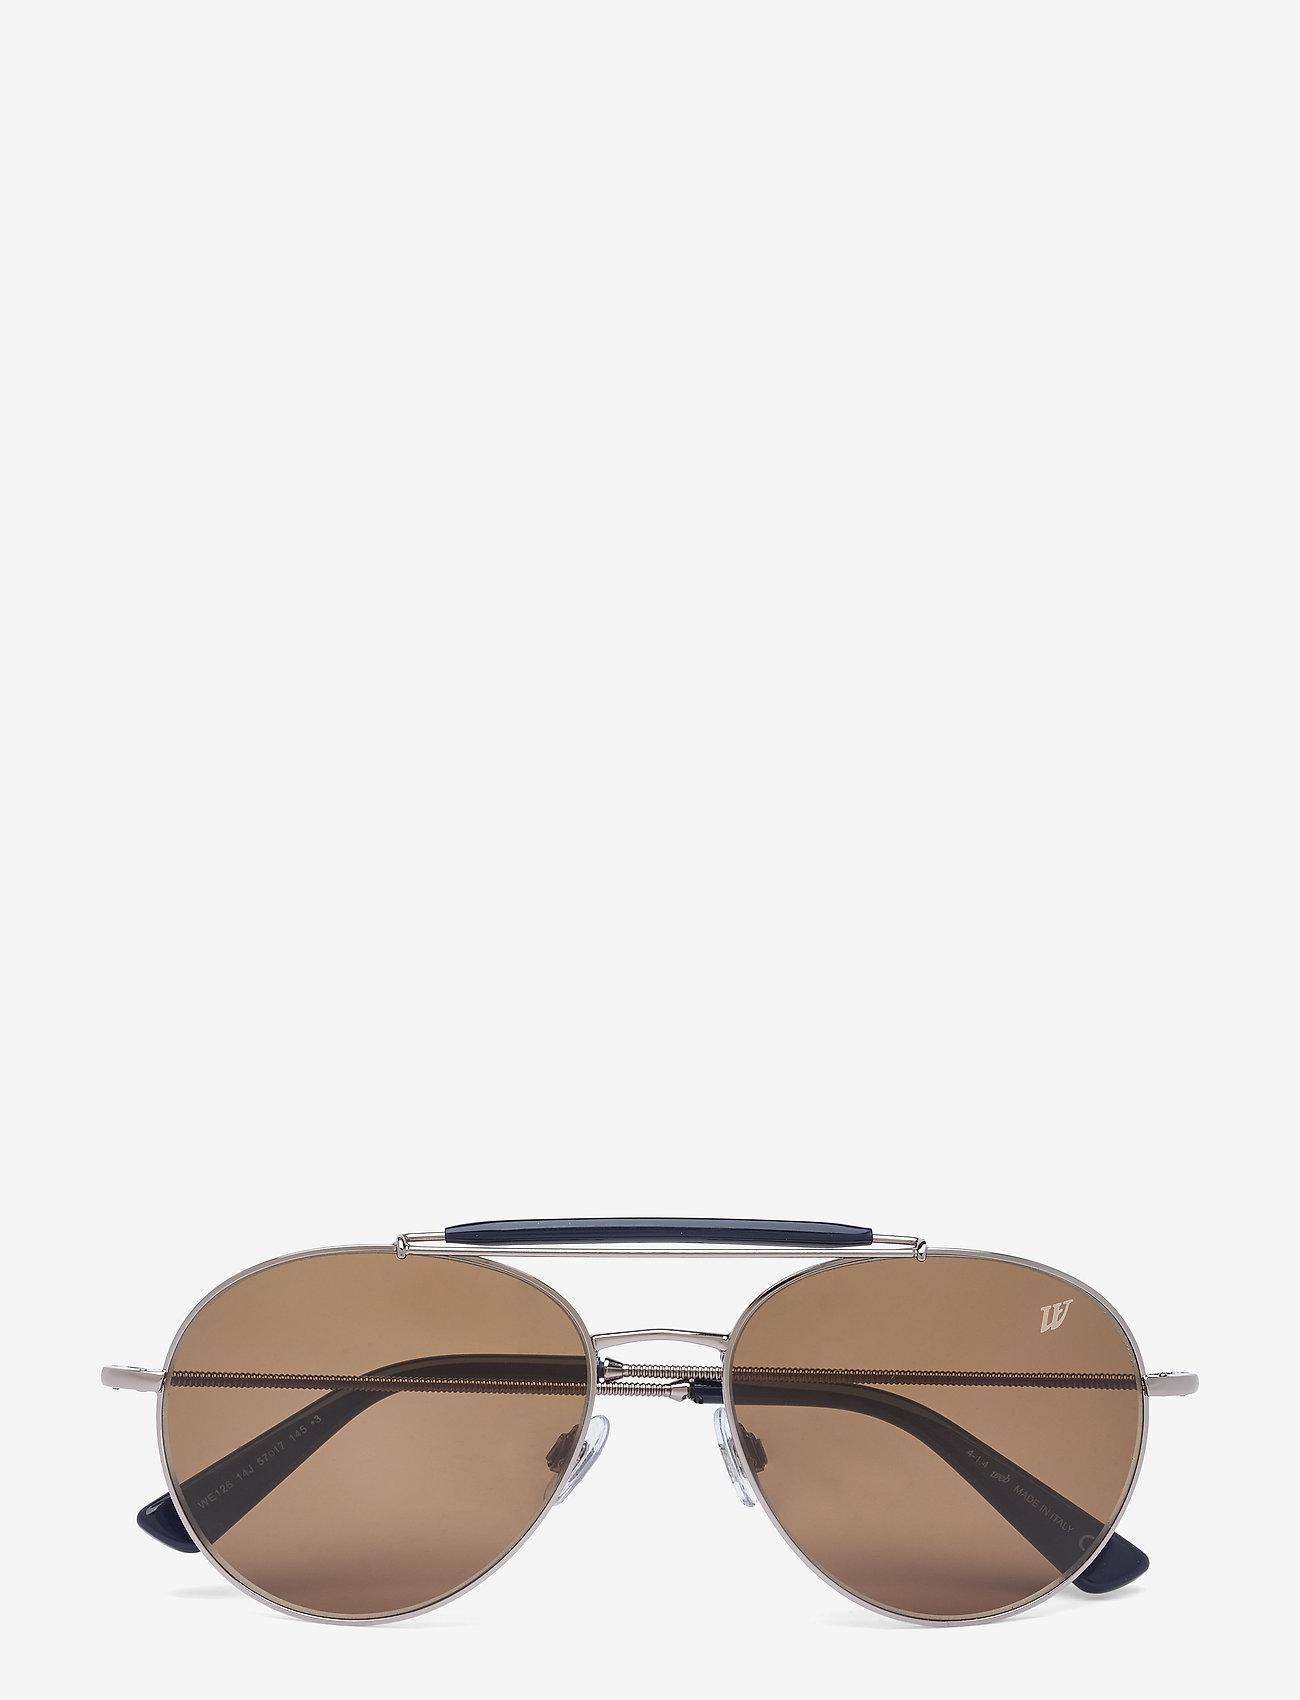 Web Eyewear - WE0126 - aviatora stila - 14j -shiny light ruthenium / roviex - 0